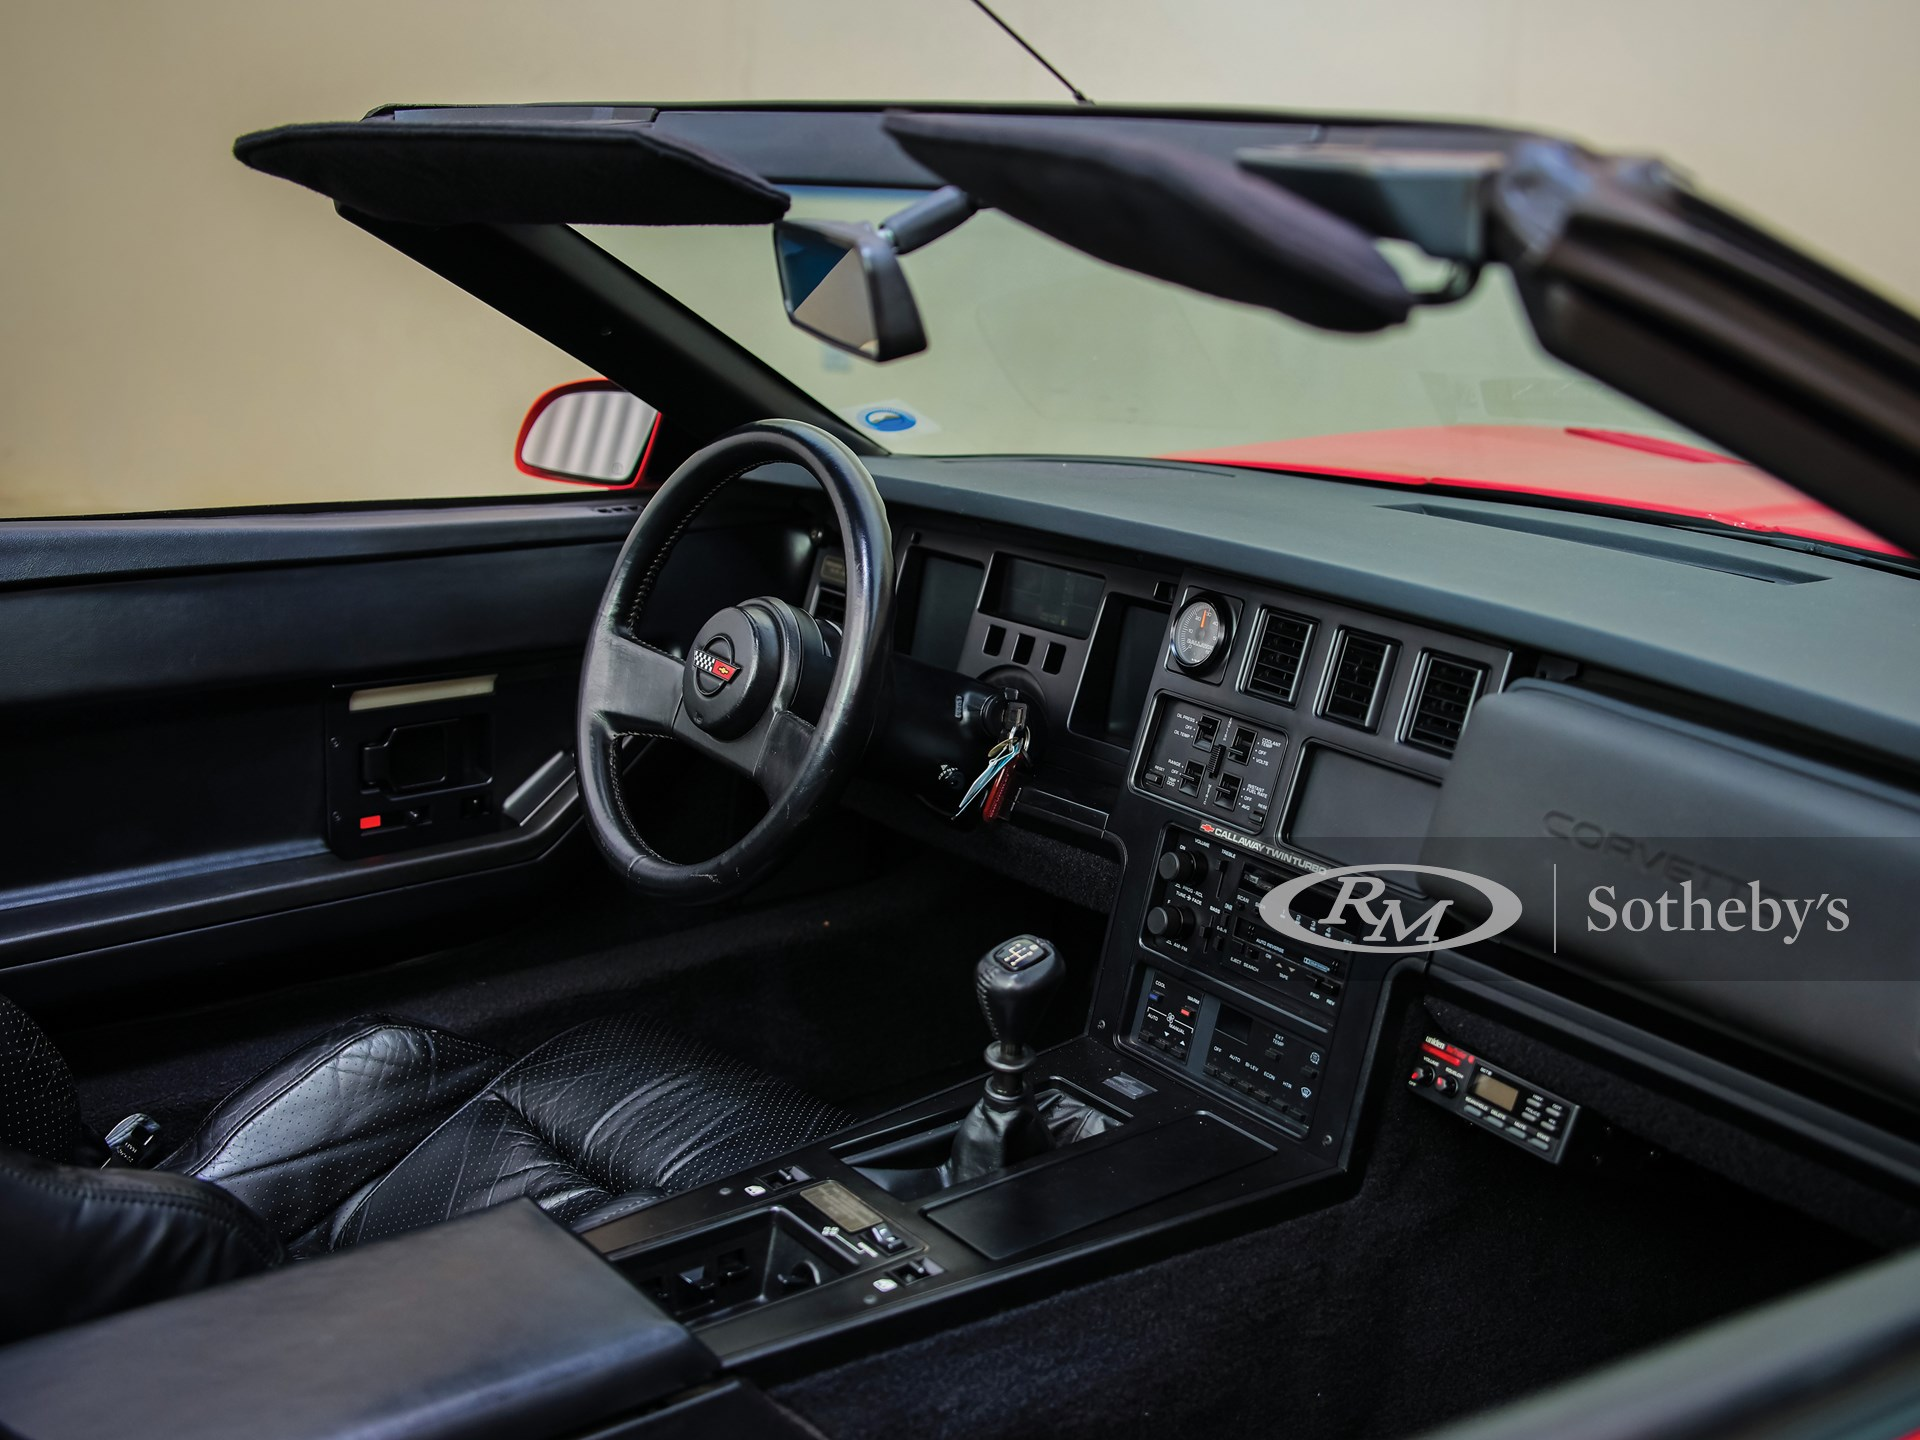 1988 Chevrolet Callaway Corvette Twin Turbo Convertible  -